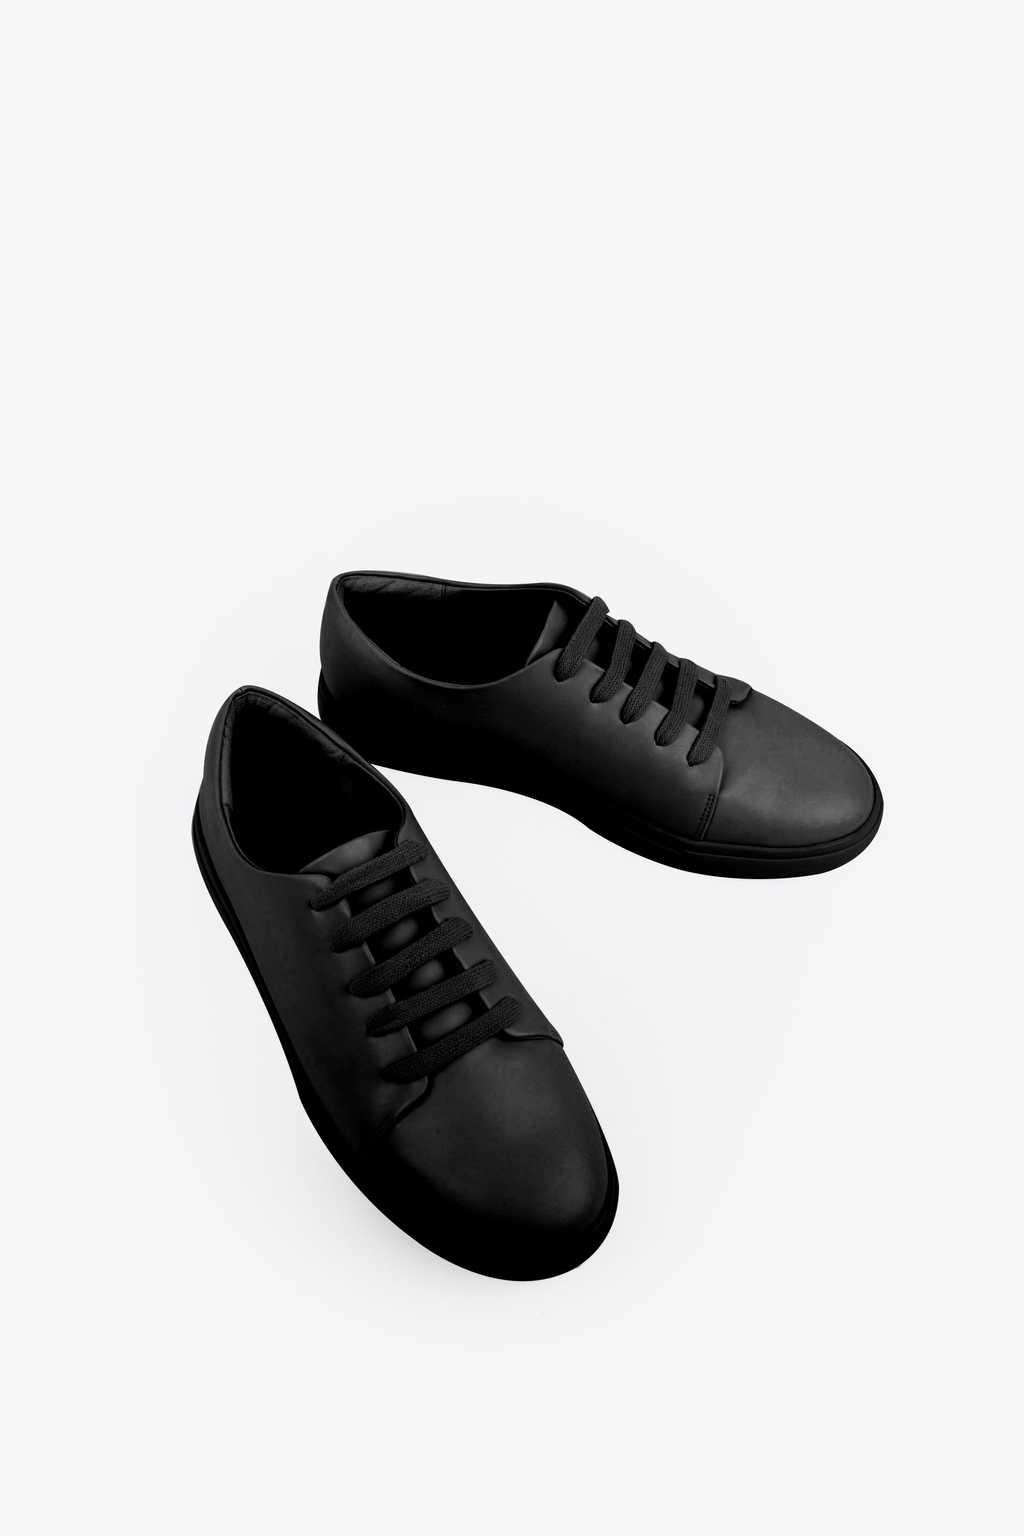 Sneaker 1339 Black 11